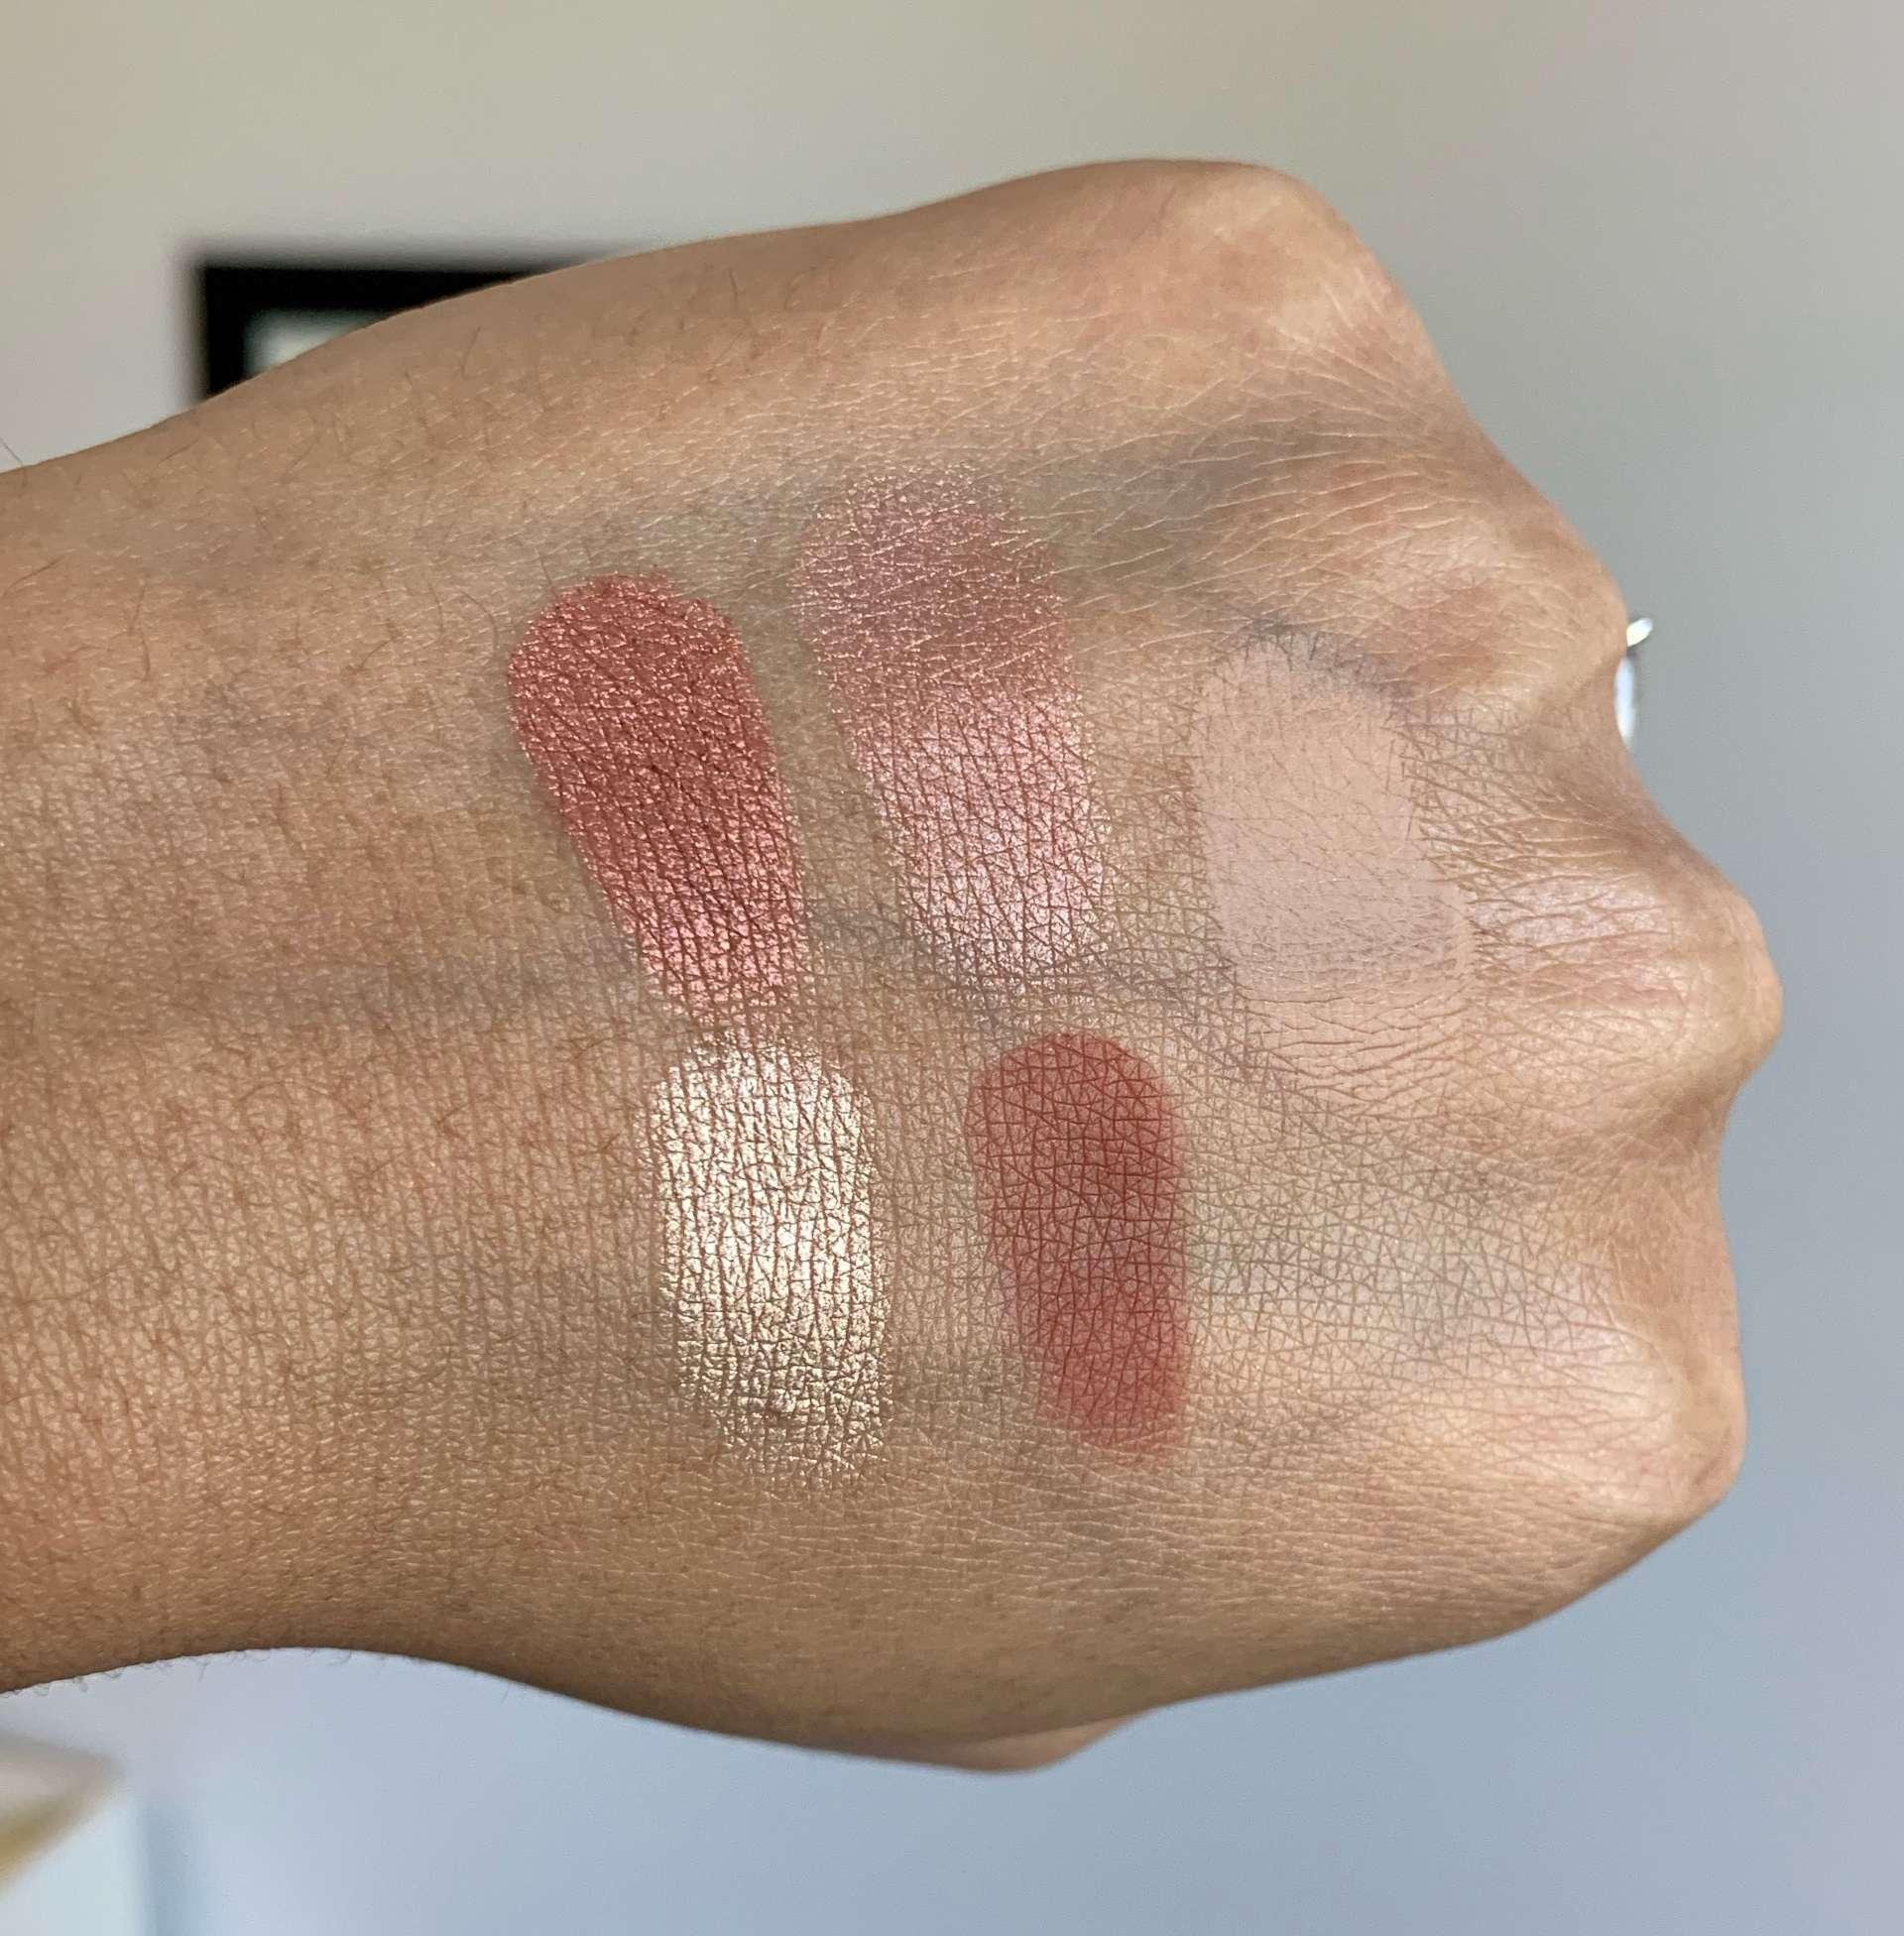 Bobbi Brown The Essential Multicolor Eye Shadow Palette in Warm Cranberry Swatches on Medium Dark Skin